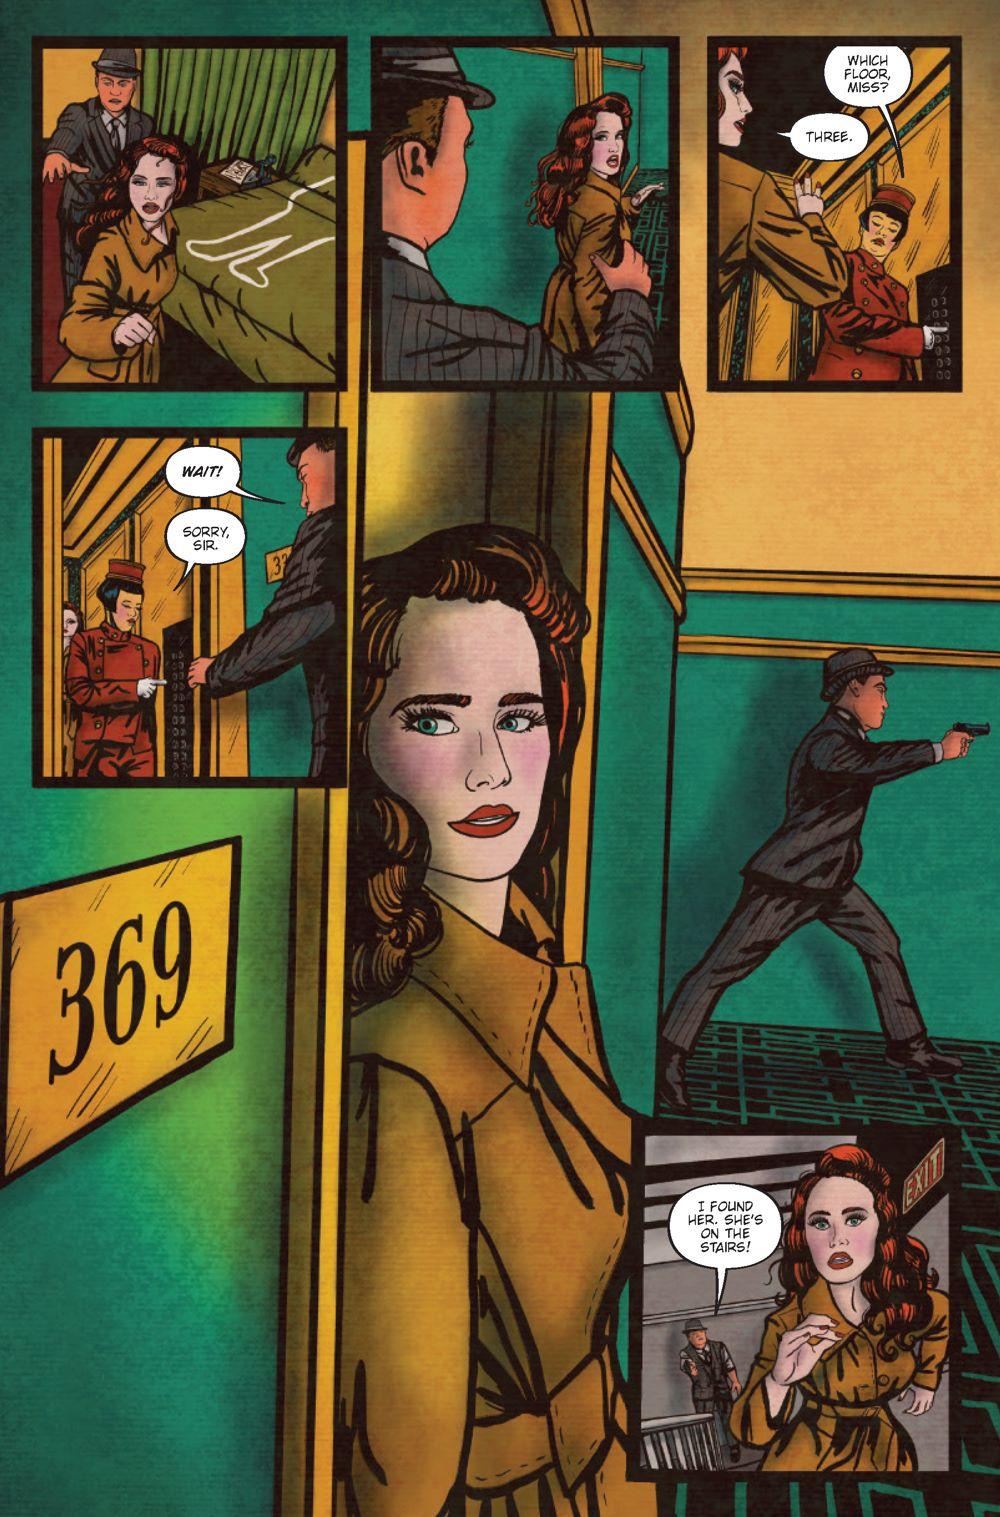 Minky-Woodcock-2-Interiors_Page_5 ComicList Previews: MINKY WOODCOCK THE GIRL WHO ELECTRIFIED TESLA #2